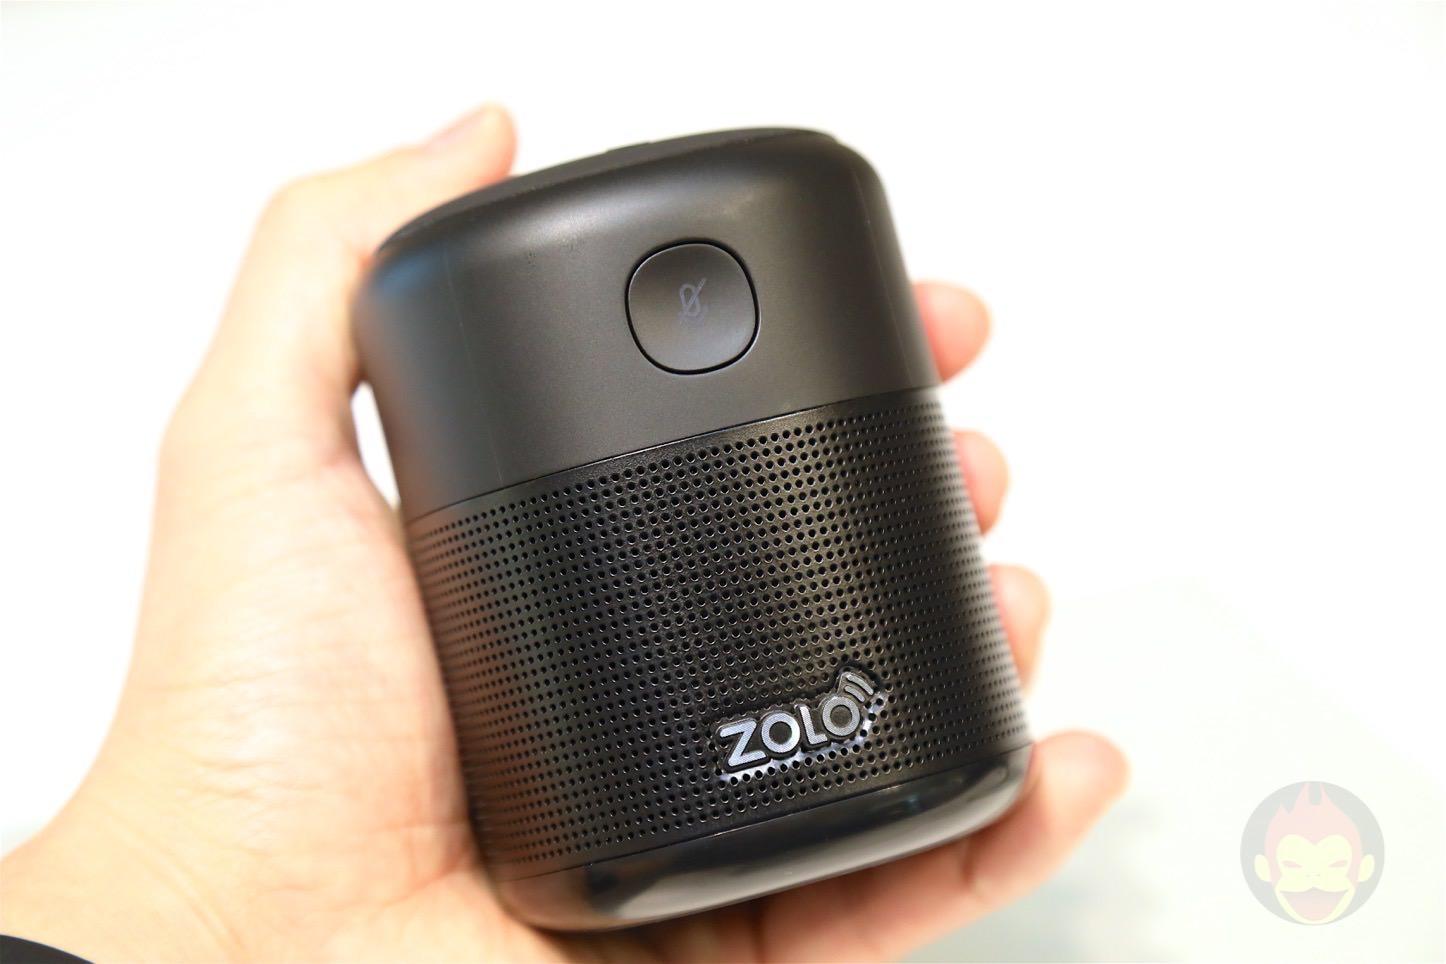 Anker-Zolo-Alexa-Speakers-04.jpg